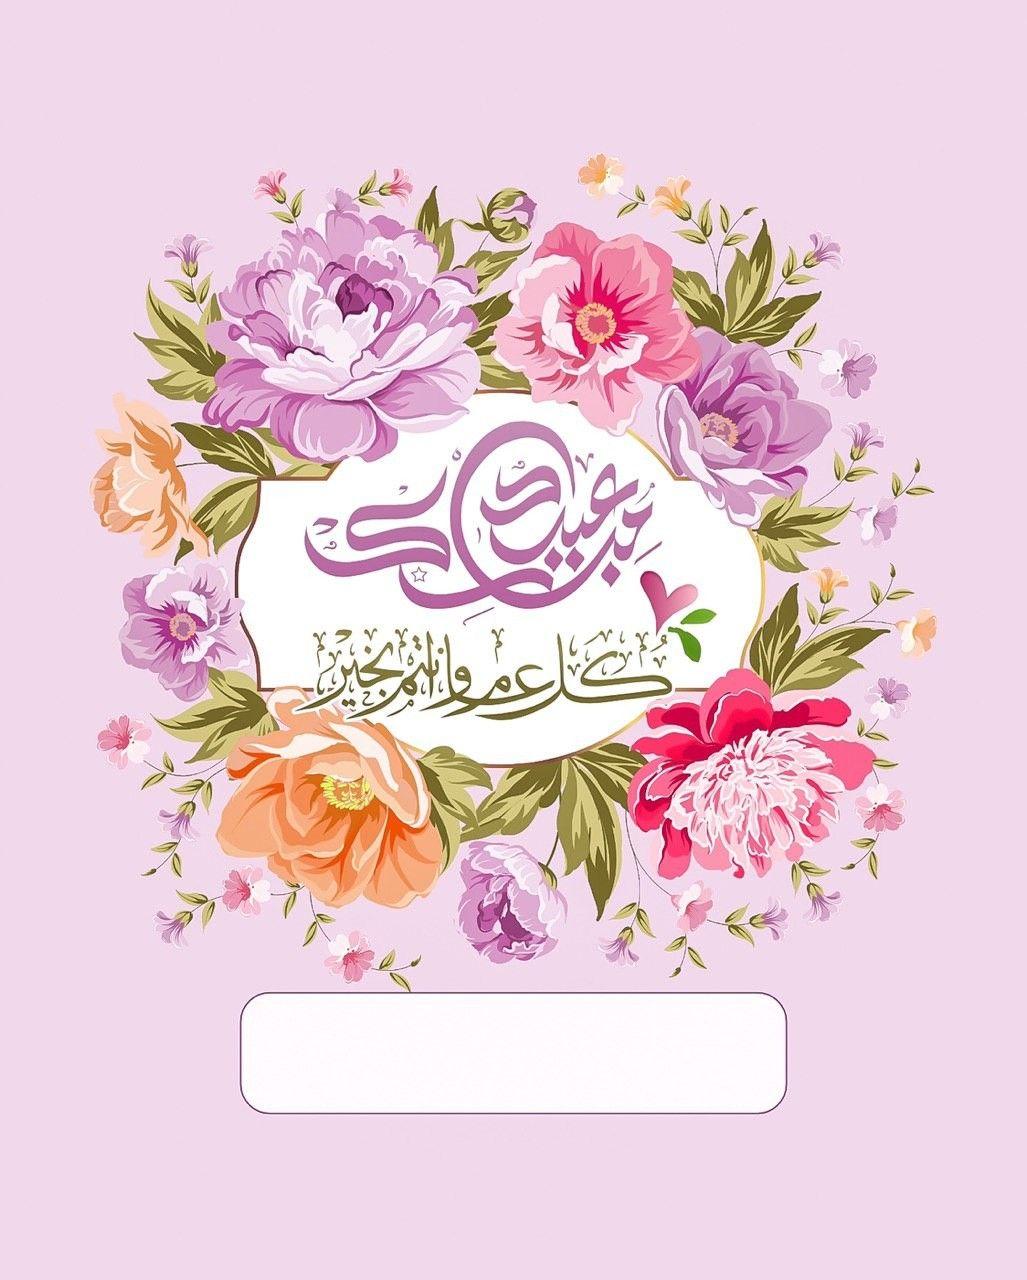 Pin By Ya Aazanaas On Eid Mubarak Eid Cards Happy Eid Eid Mubarak